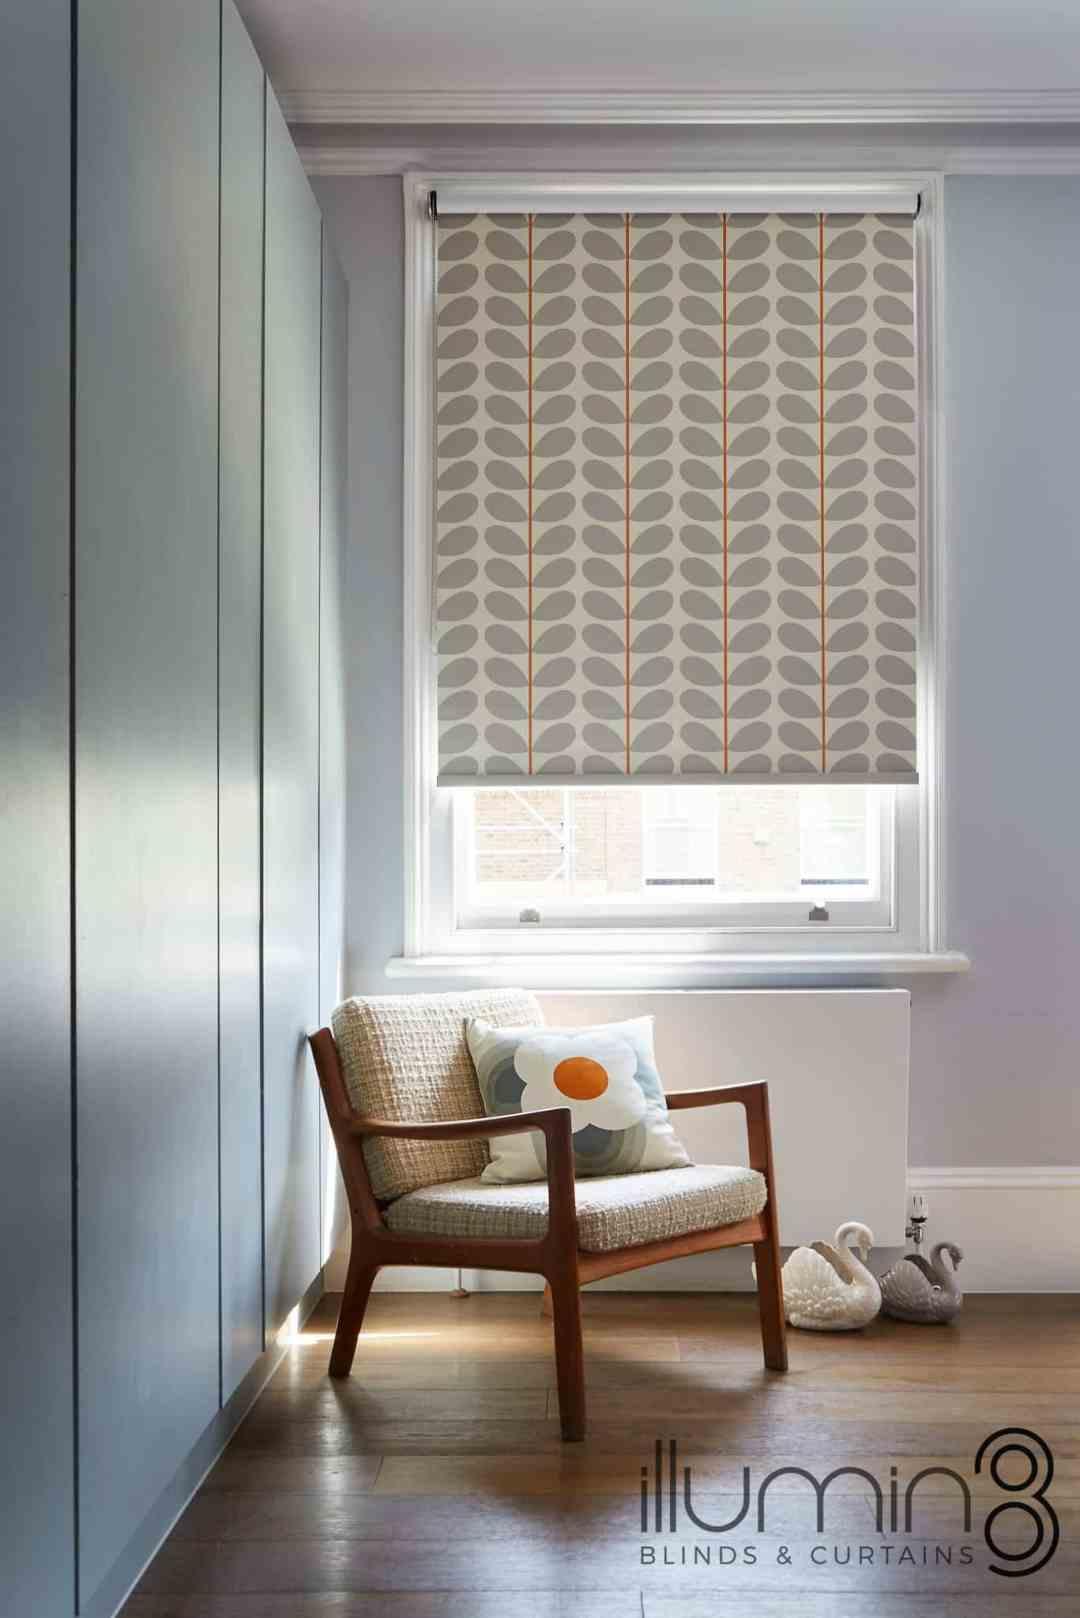 Orla Kiely Blinds, living room blinds at Village Blinds Ballymena